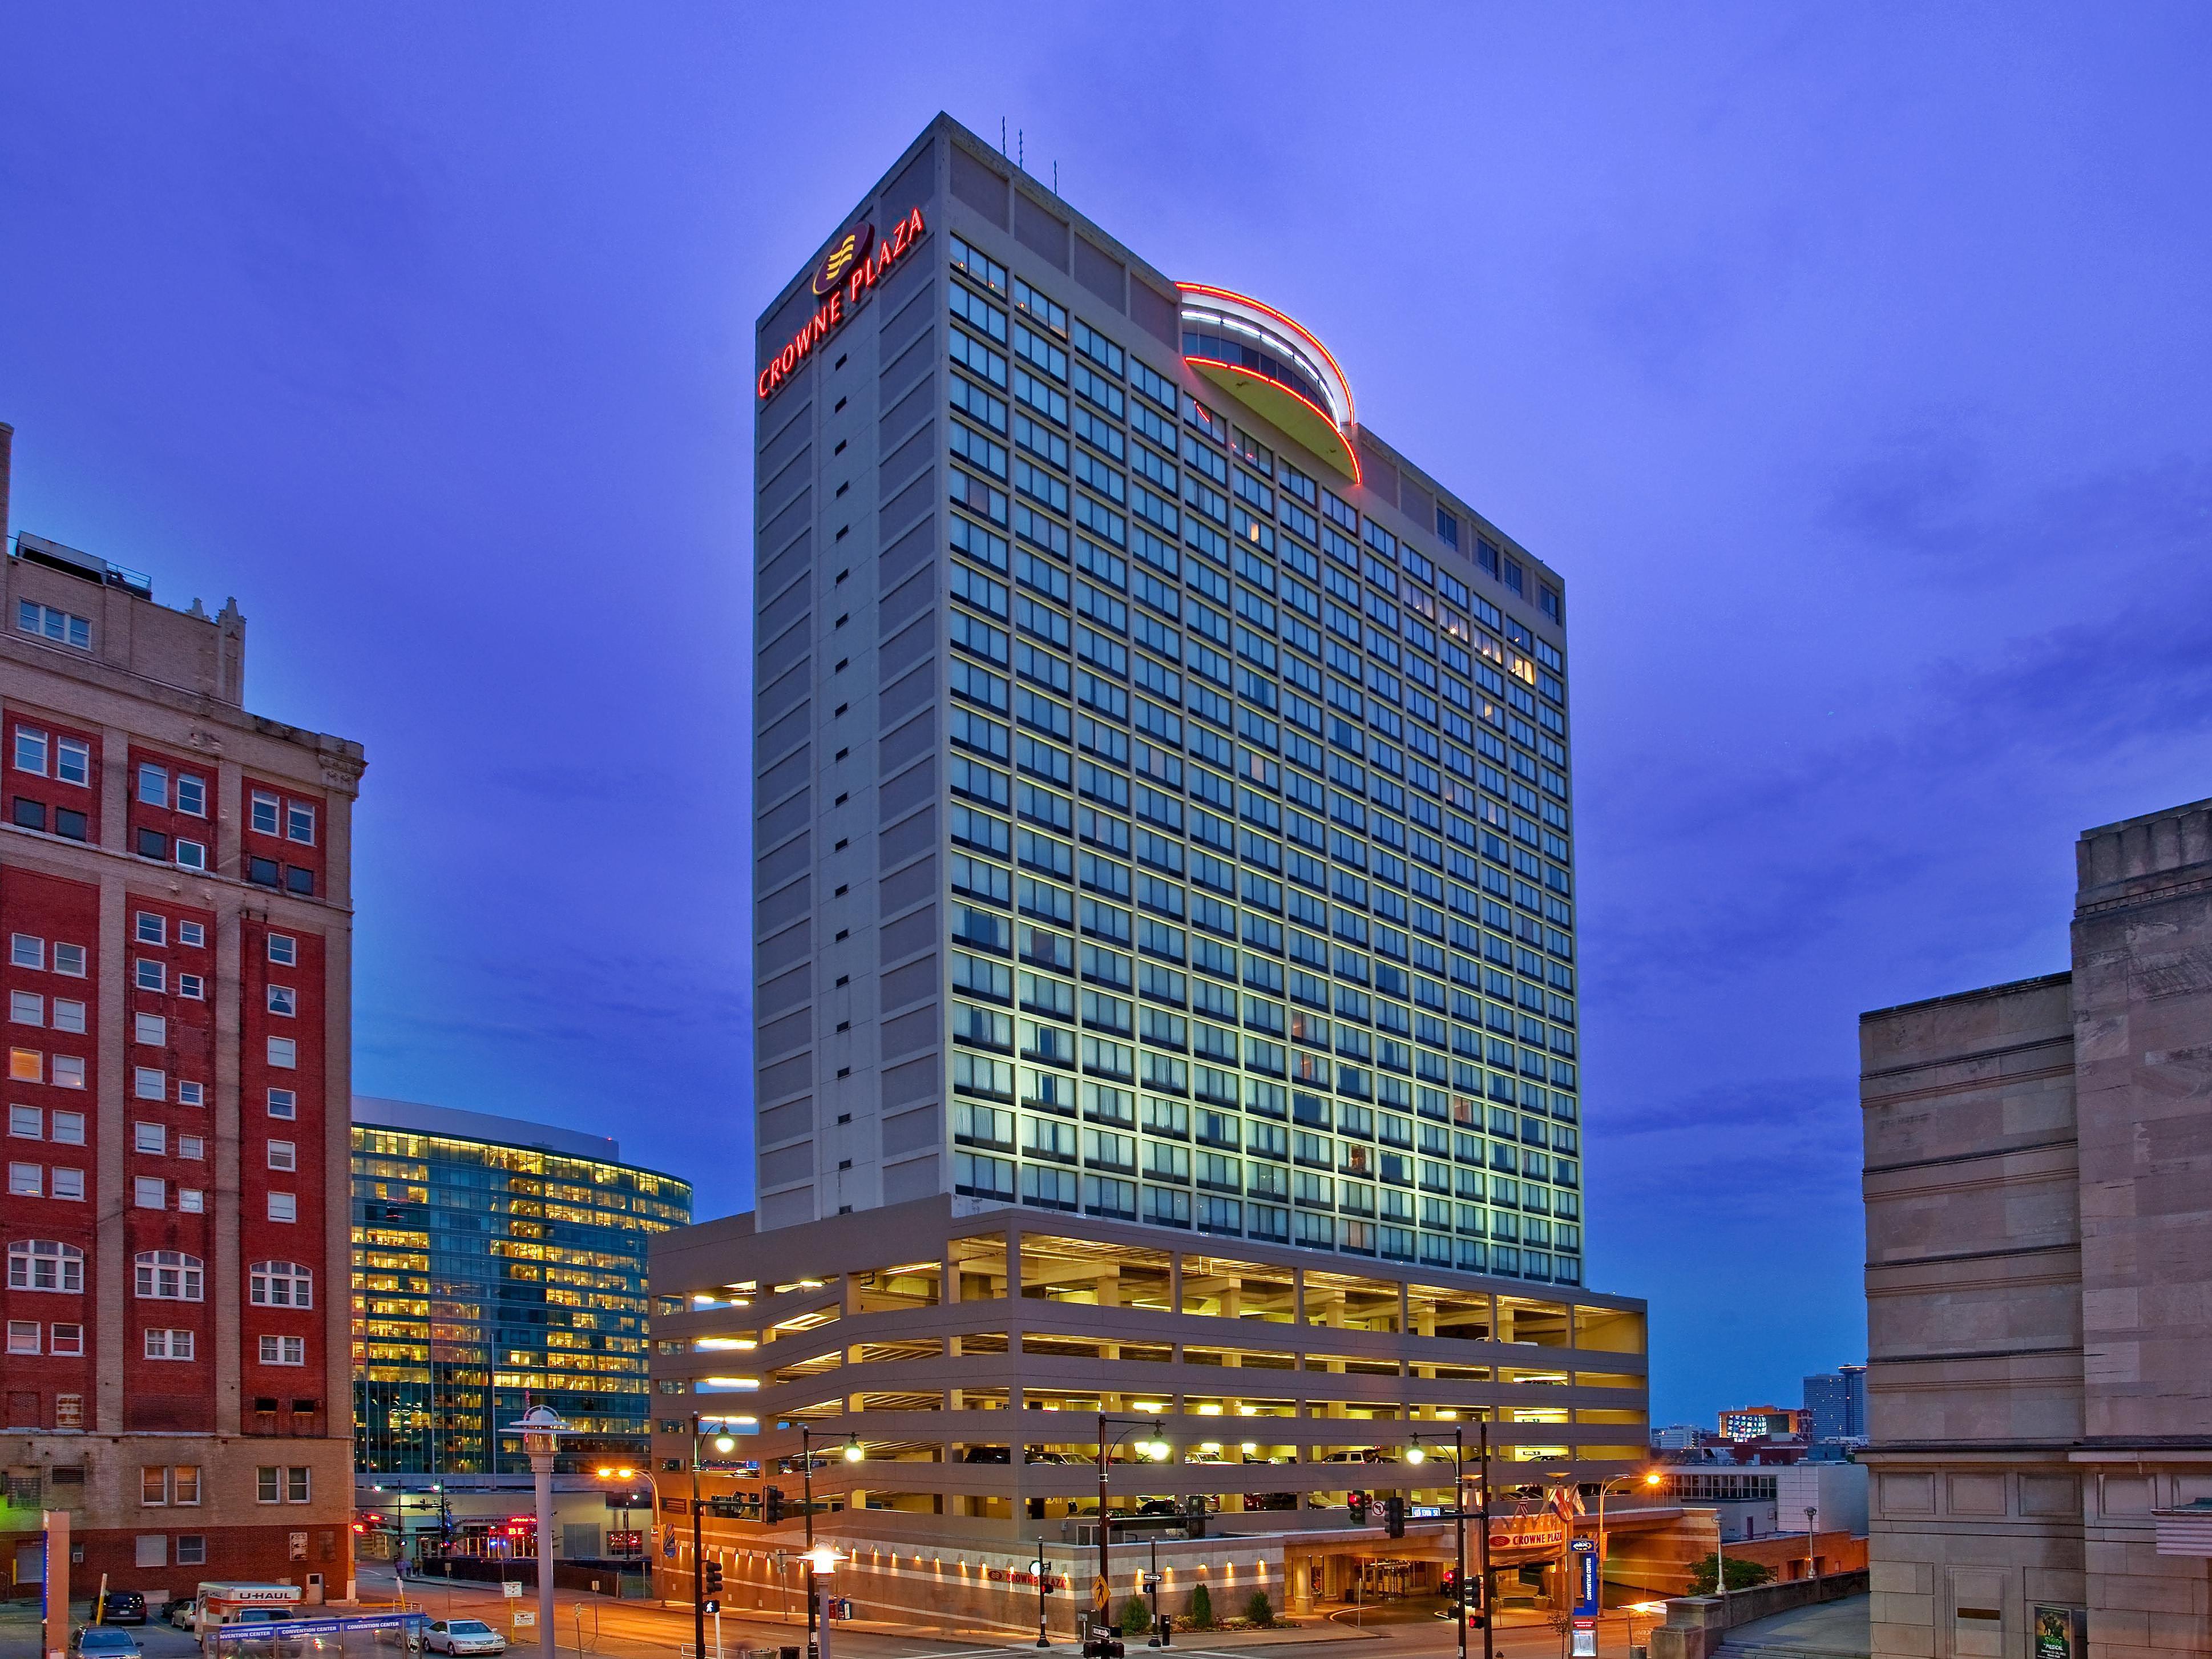 Kansas City Convention Center Hotels Crowne Plaza Kansas City Downtown